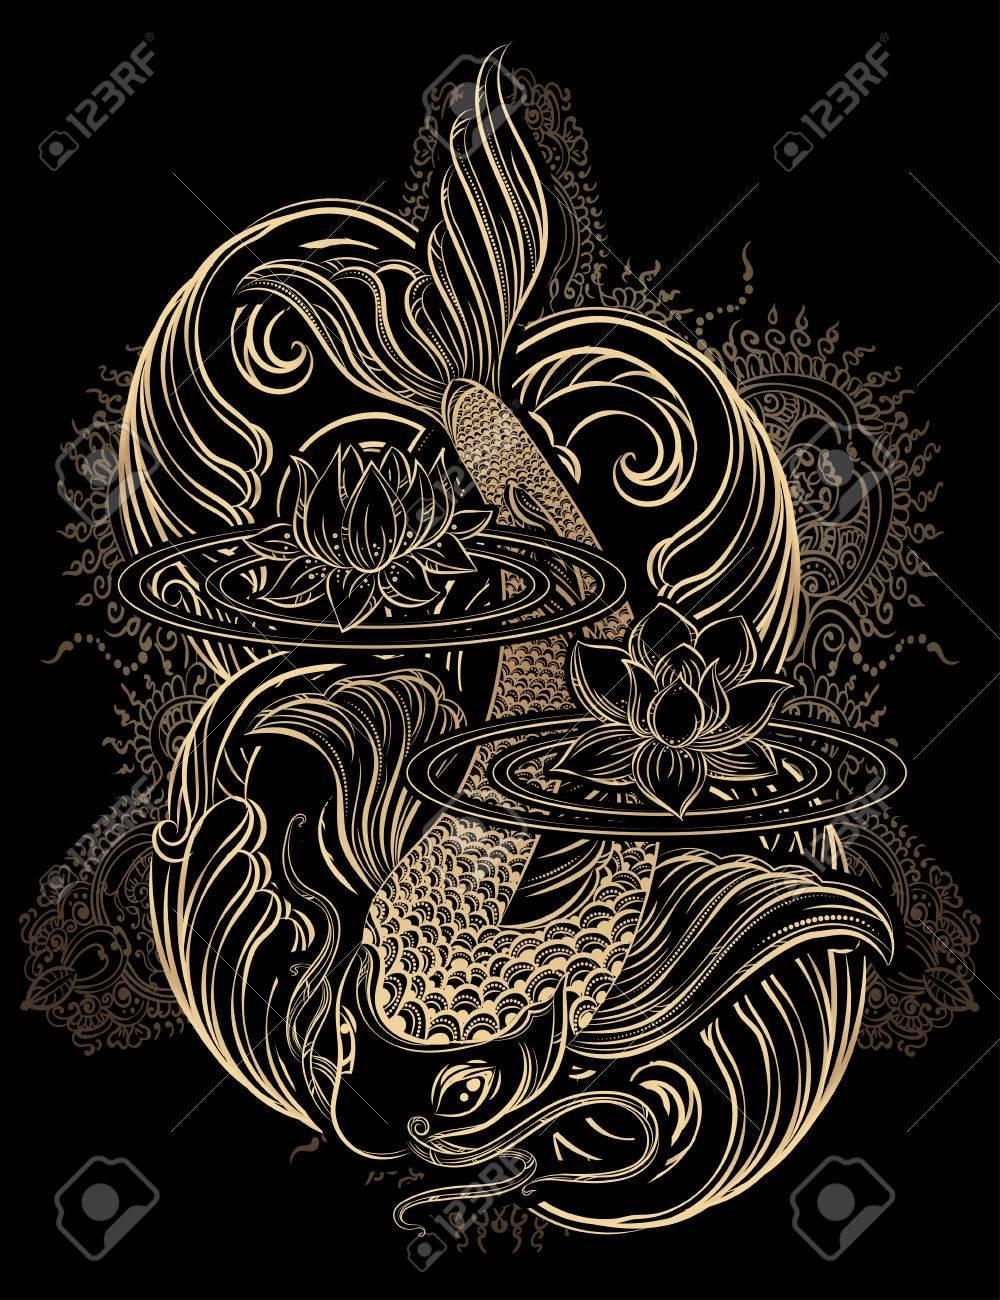 Hand Drawn Asian Spiritual Symbols Gold Koi Carp With Lotus And